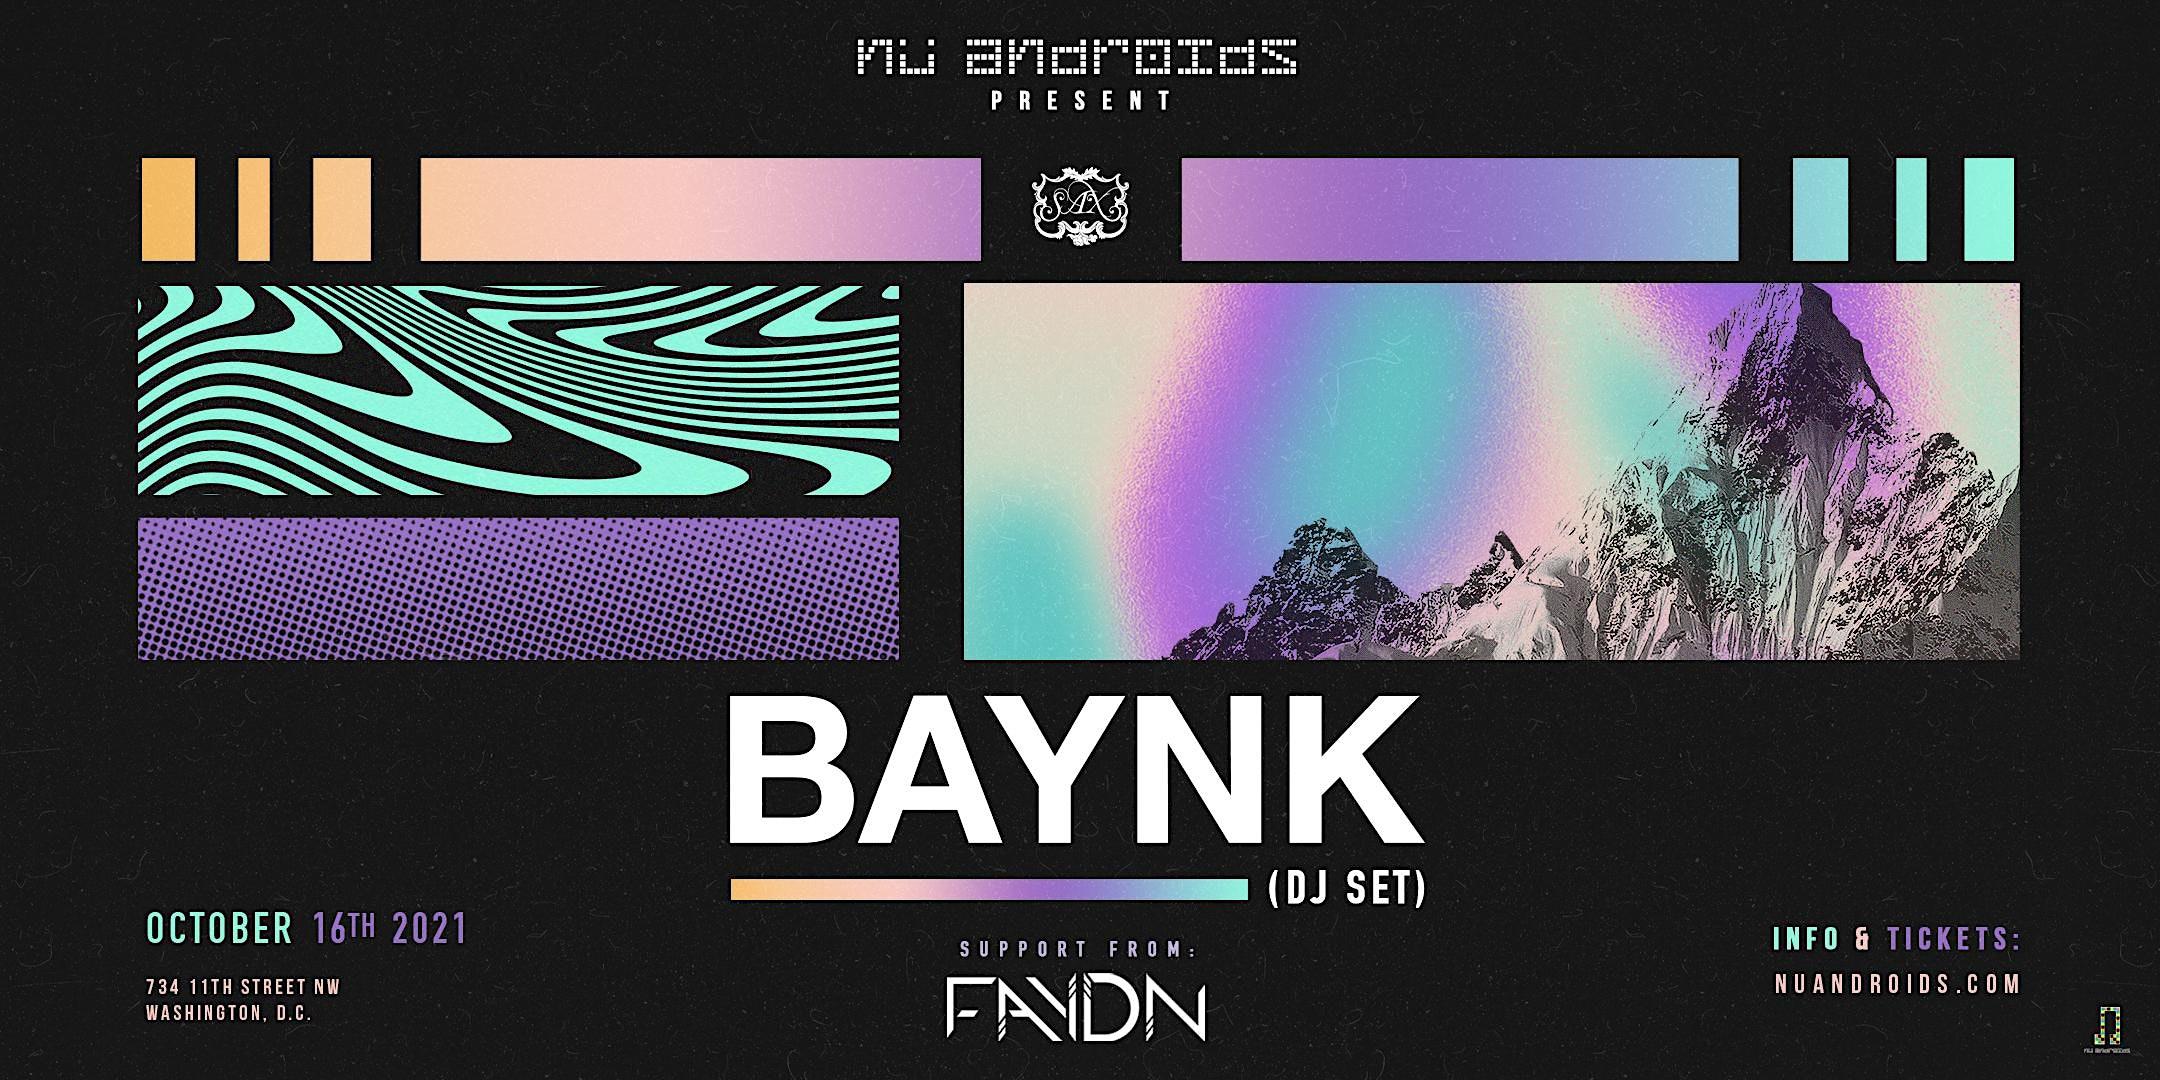 Nü Androids Presents: BAYNK DJ Set (21+)